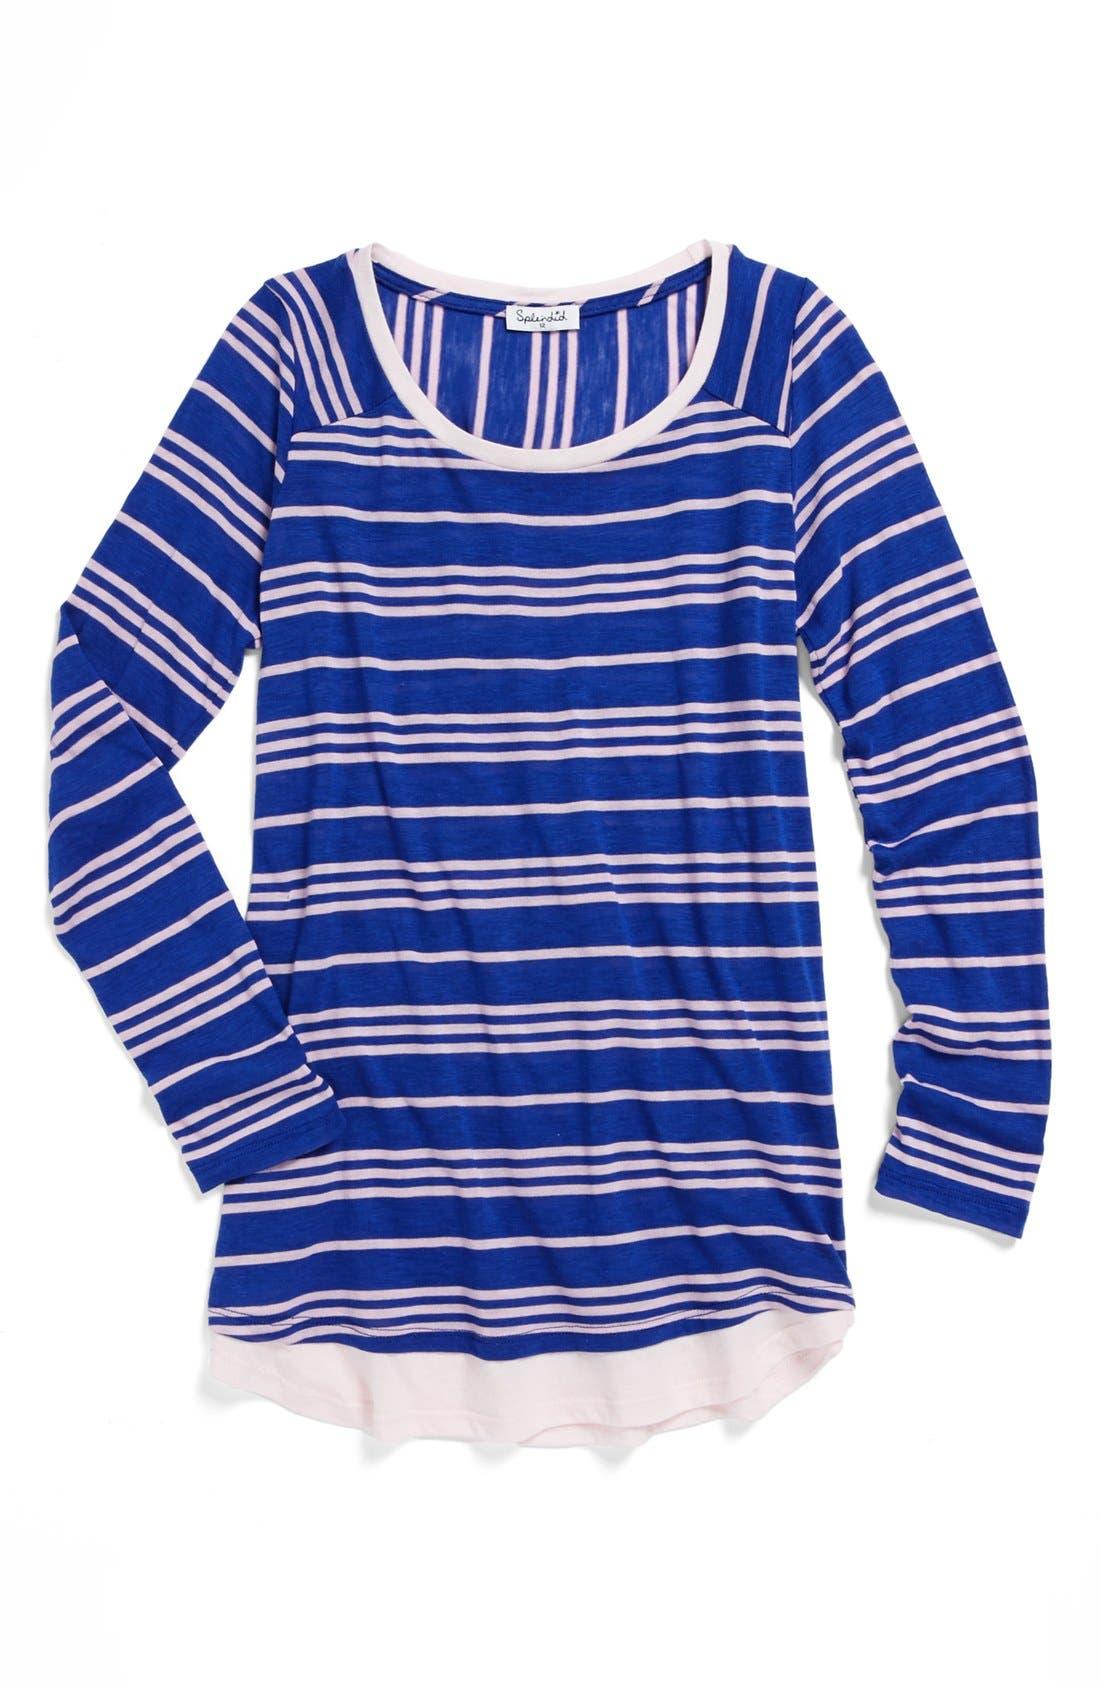 Alternate Image 1 Selected - Splendid Stripe Tunic (Big Girls)